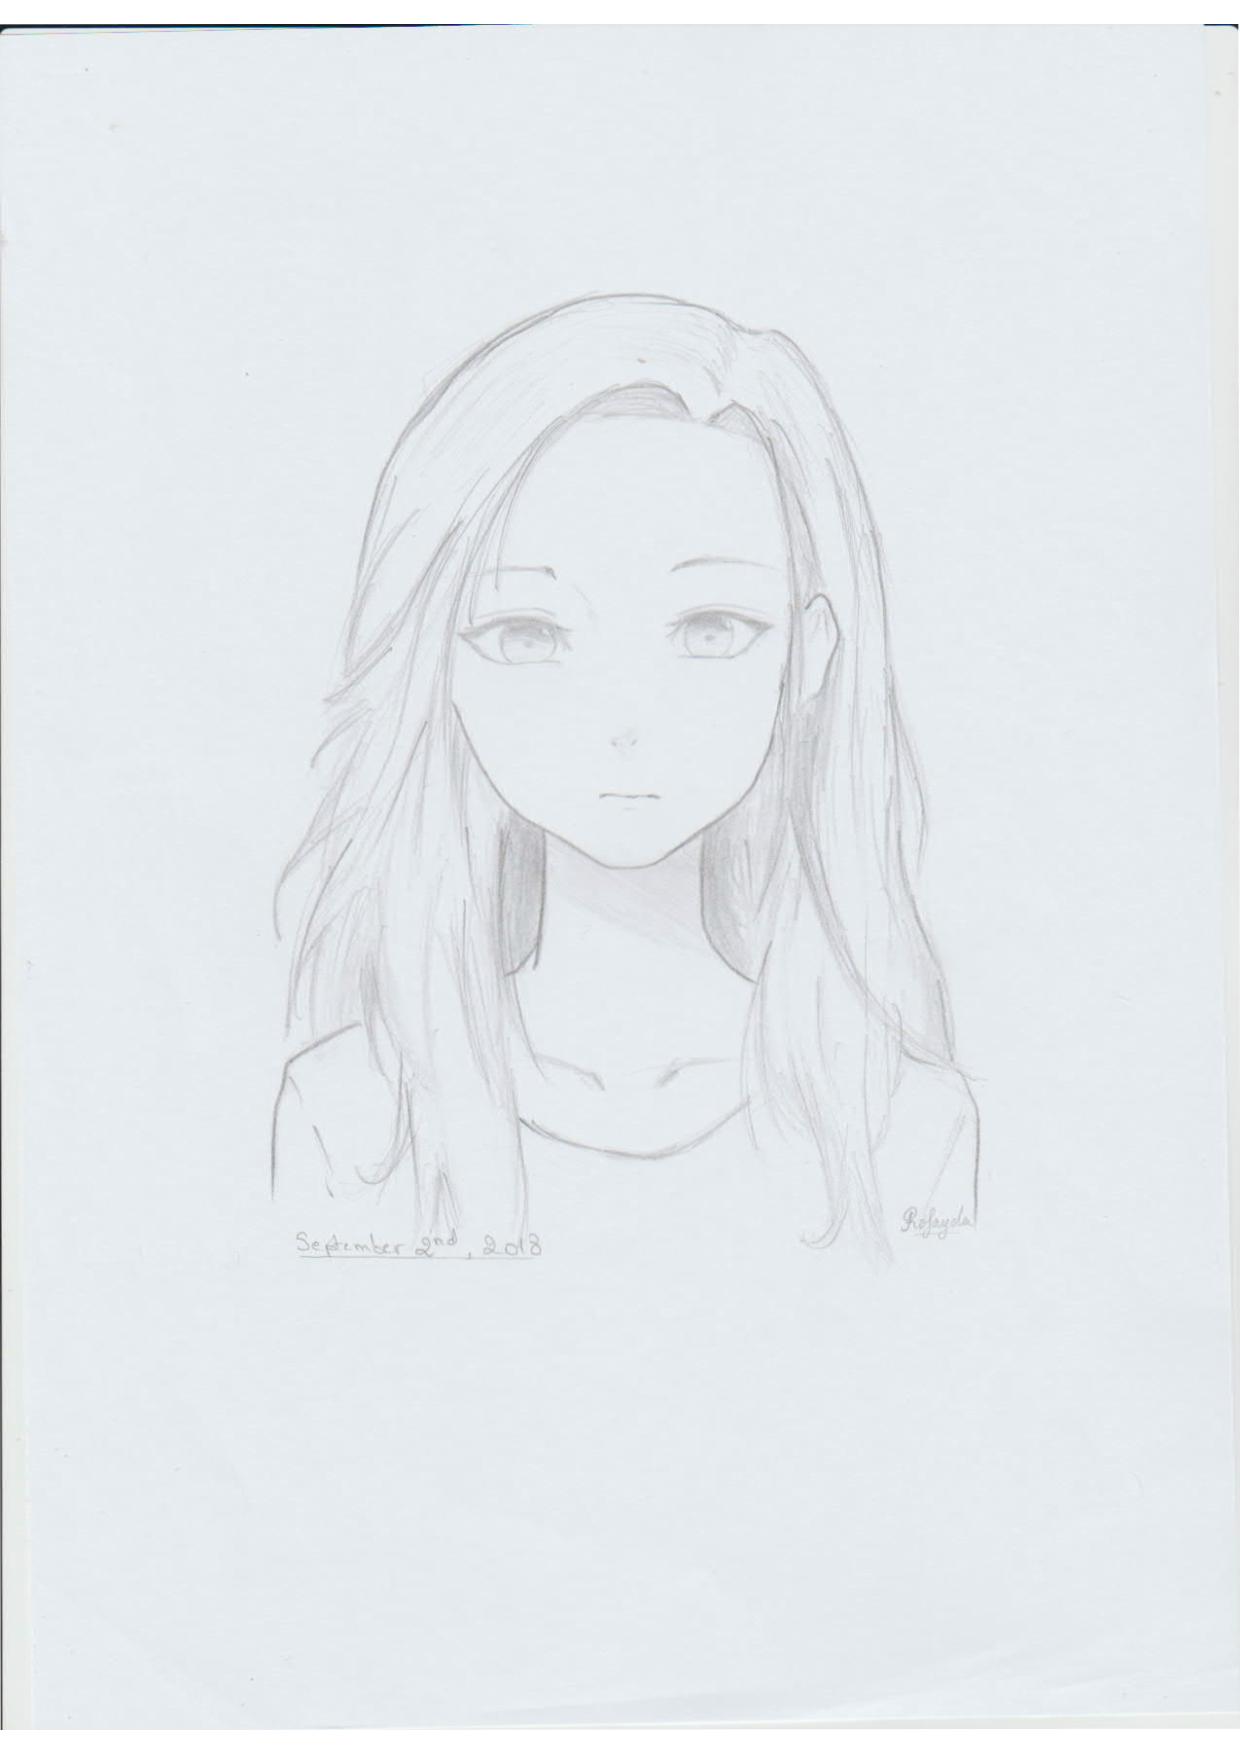 mangagirlpencilpotrait